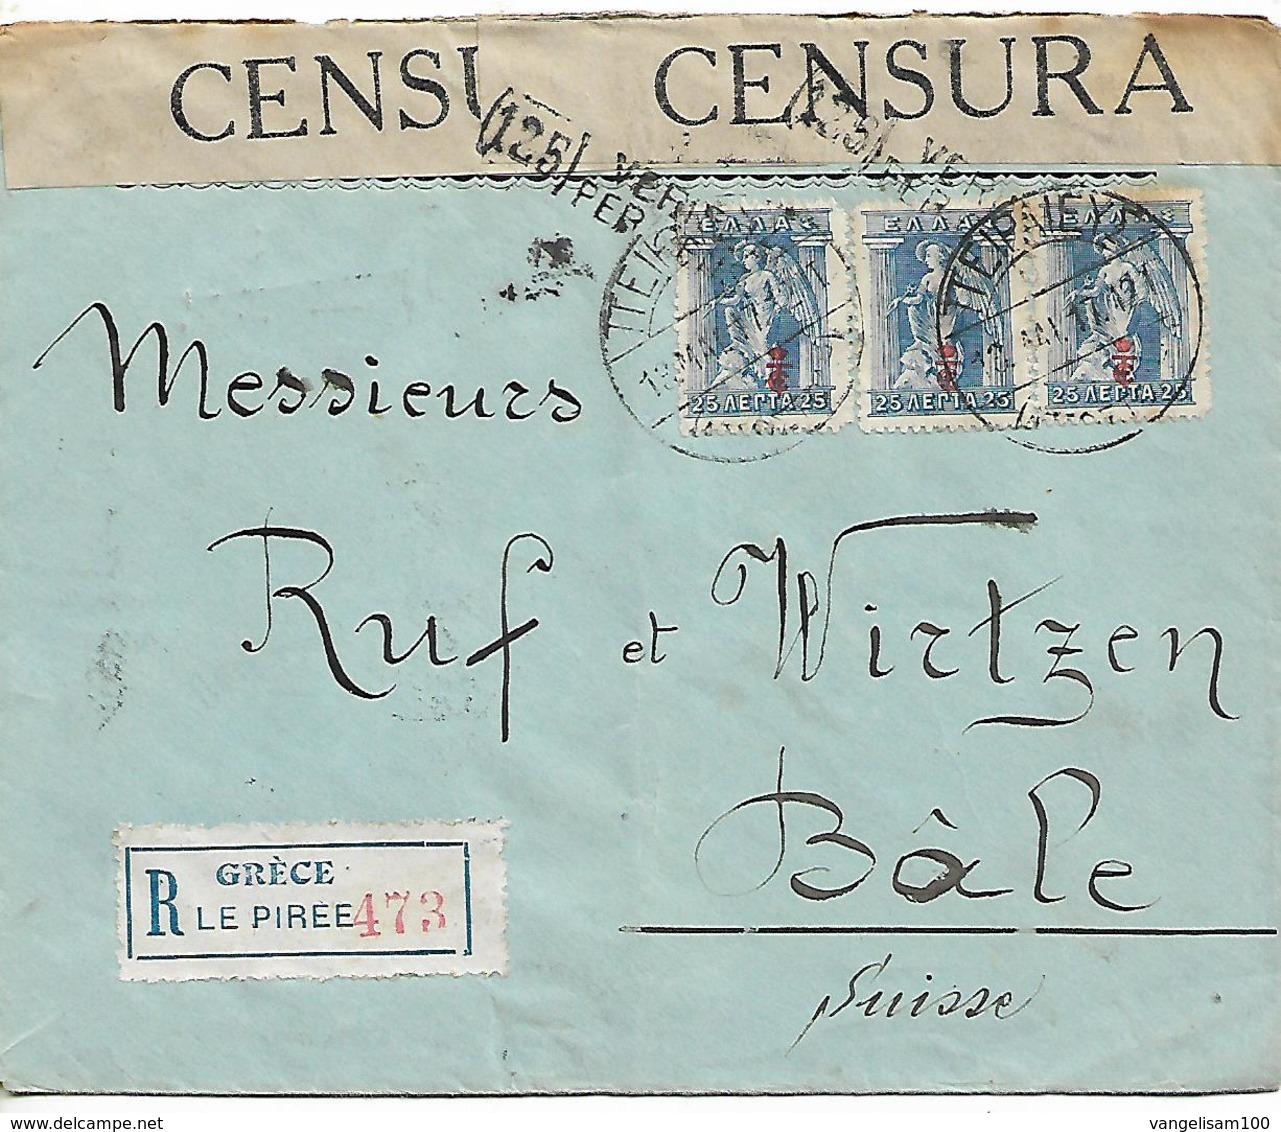 GREECE 1917 REGISTERED CENSORED COVER Sent To Bale COVER USED - Brieven En Documenten